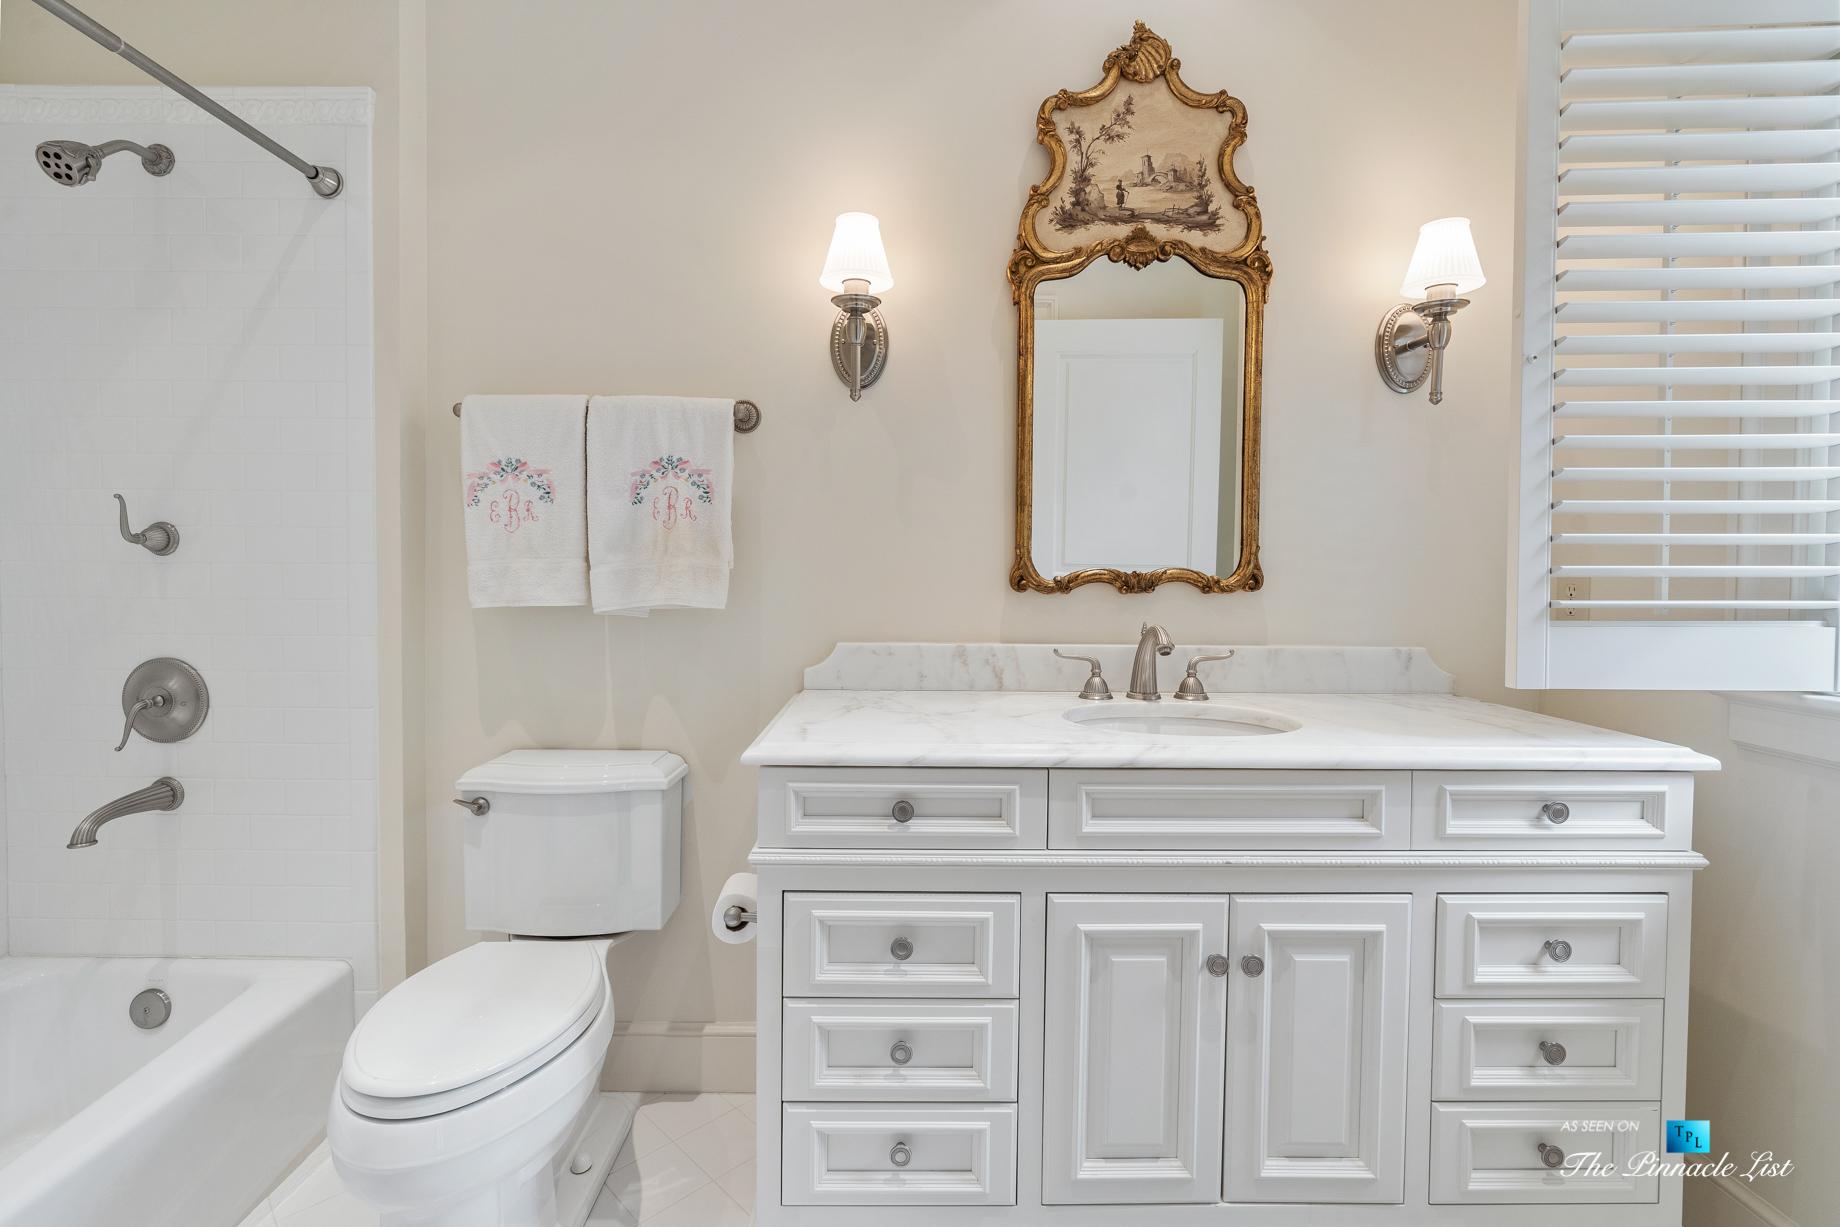 439 Blackland Rd NW, Atlanta, GA, USA - Bathroom - Luxury Real Estate - Tuxedo Park Mediterranean Mansion Home